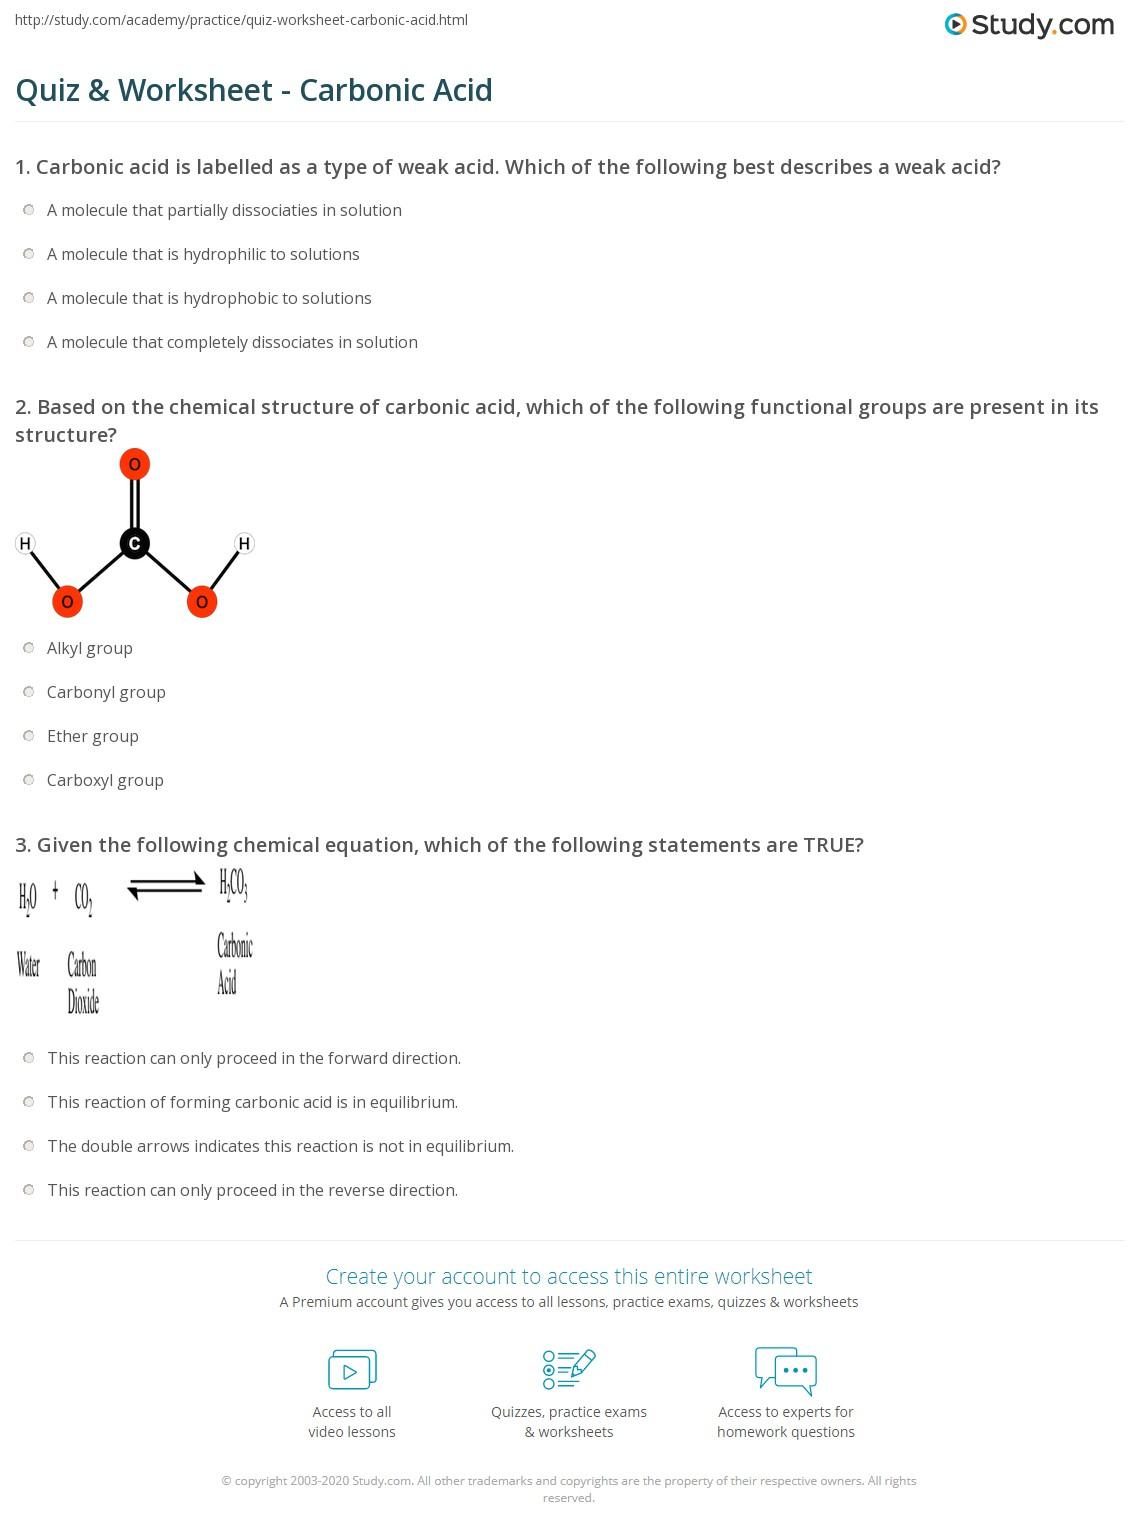 Quiz Worksheet Carbonic Acid Study Com